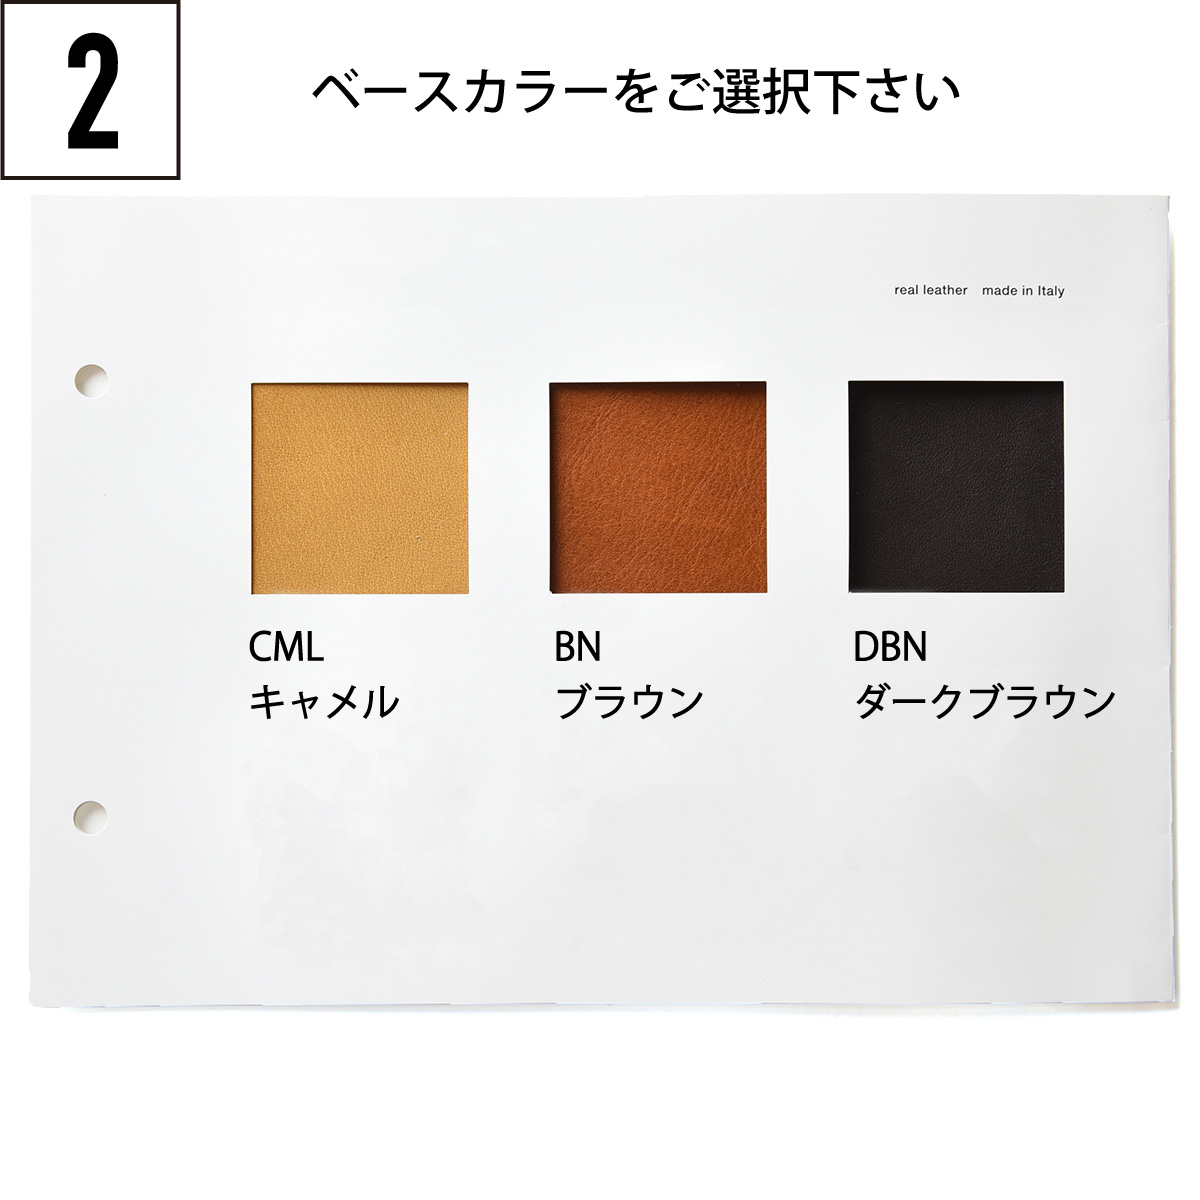 iPhoneOpenCase:   Limited Design:2